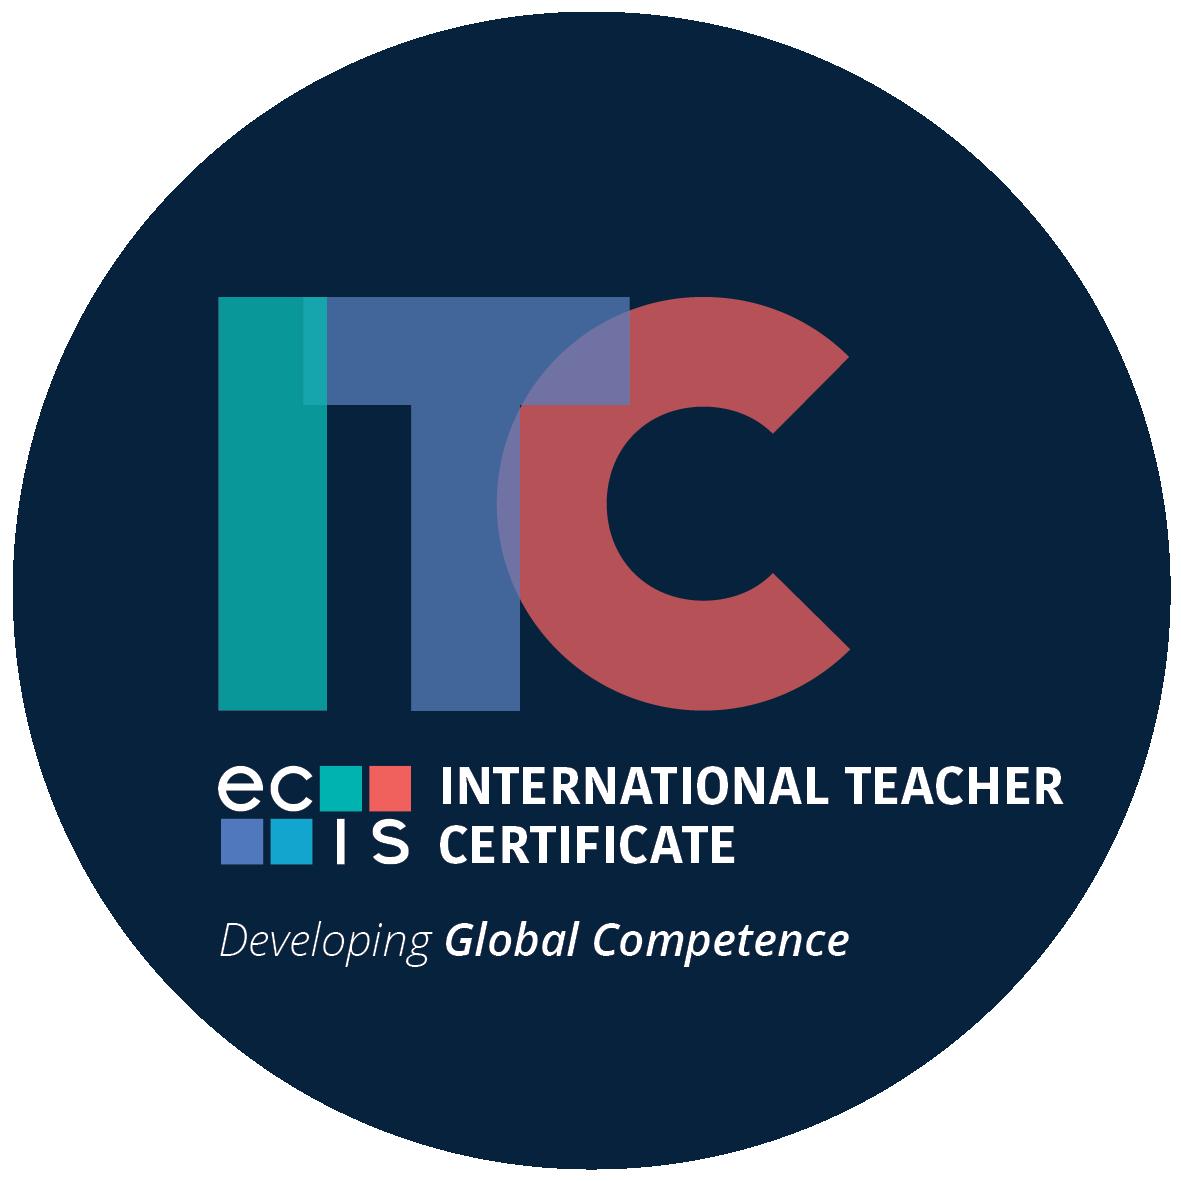 International Teacher Certificate Unit 1: Education in a Global Context